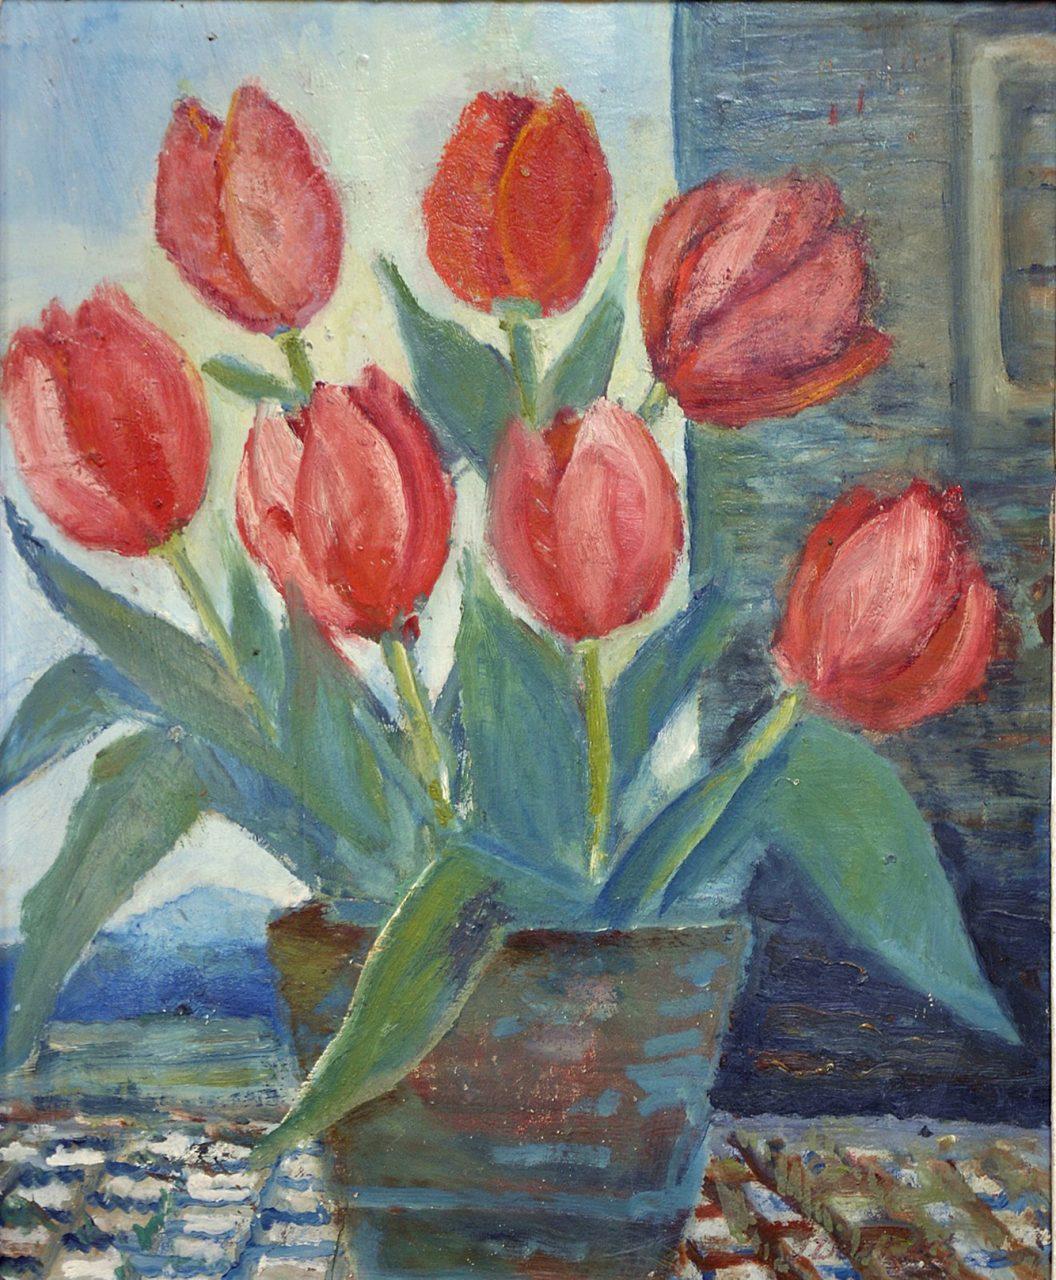 008. DOUKAS  Jean (1895-1961)